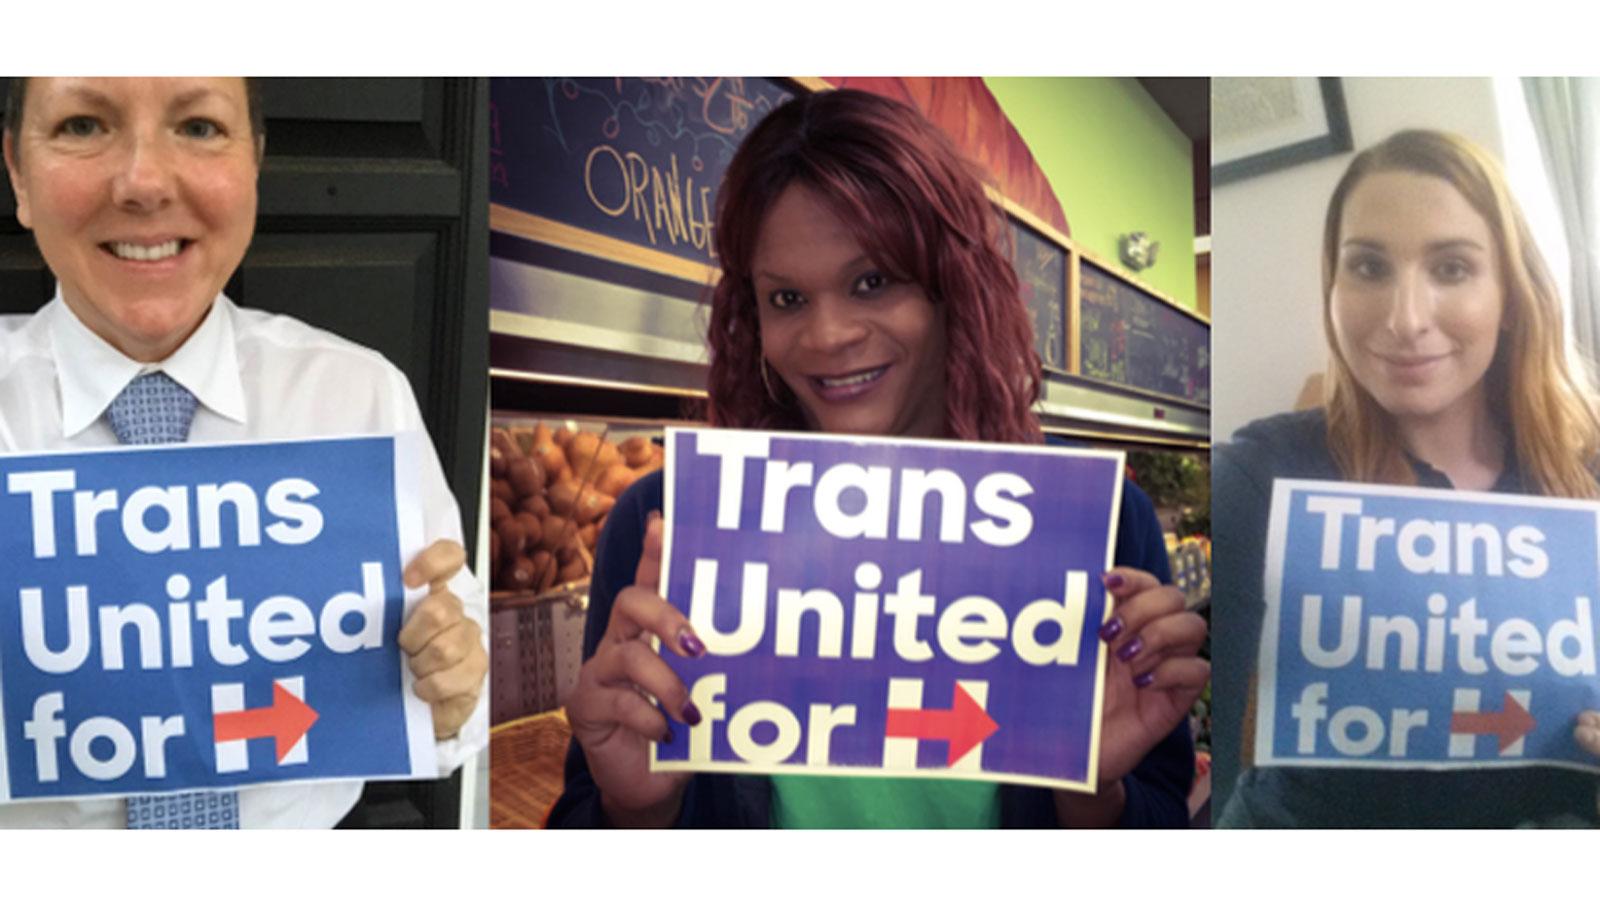 Transgender community; HRC; Hillary Clinton